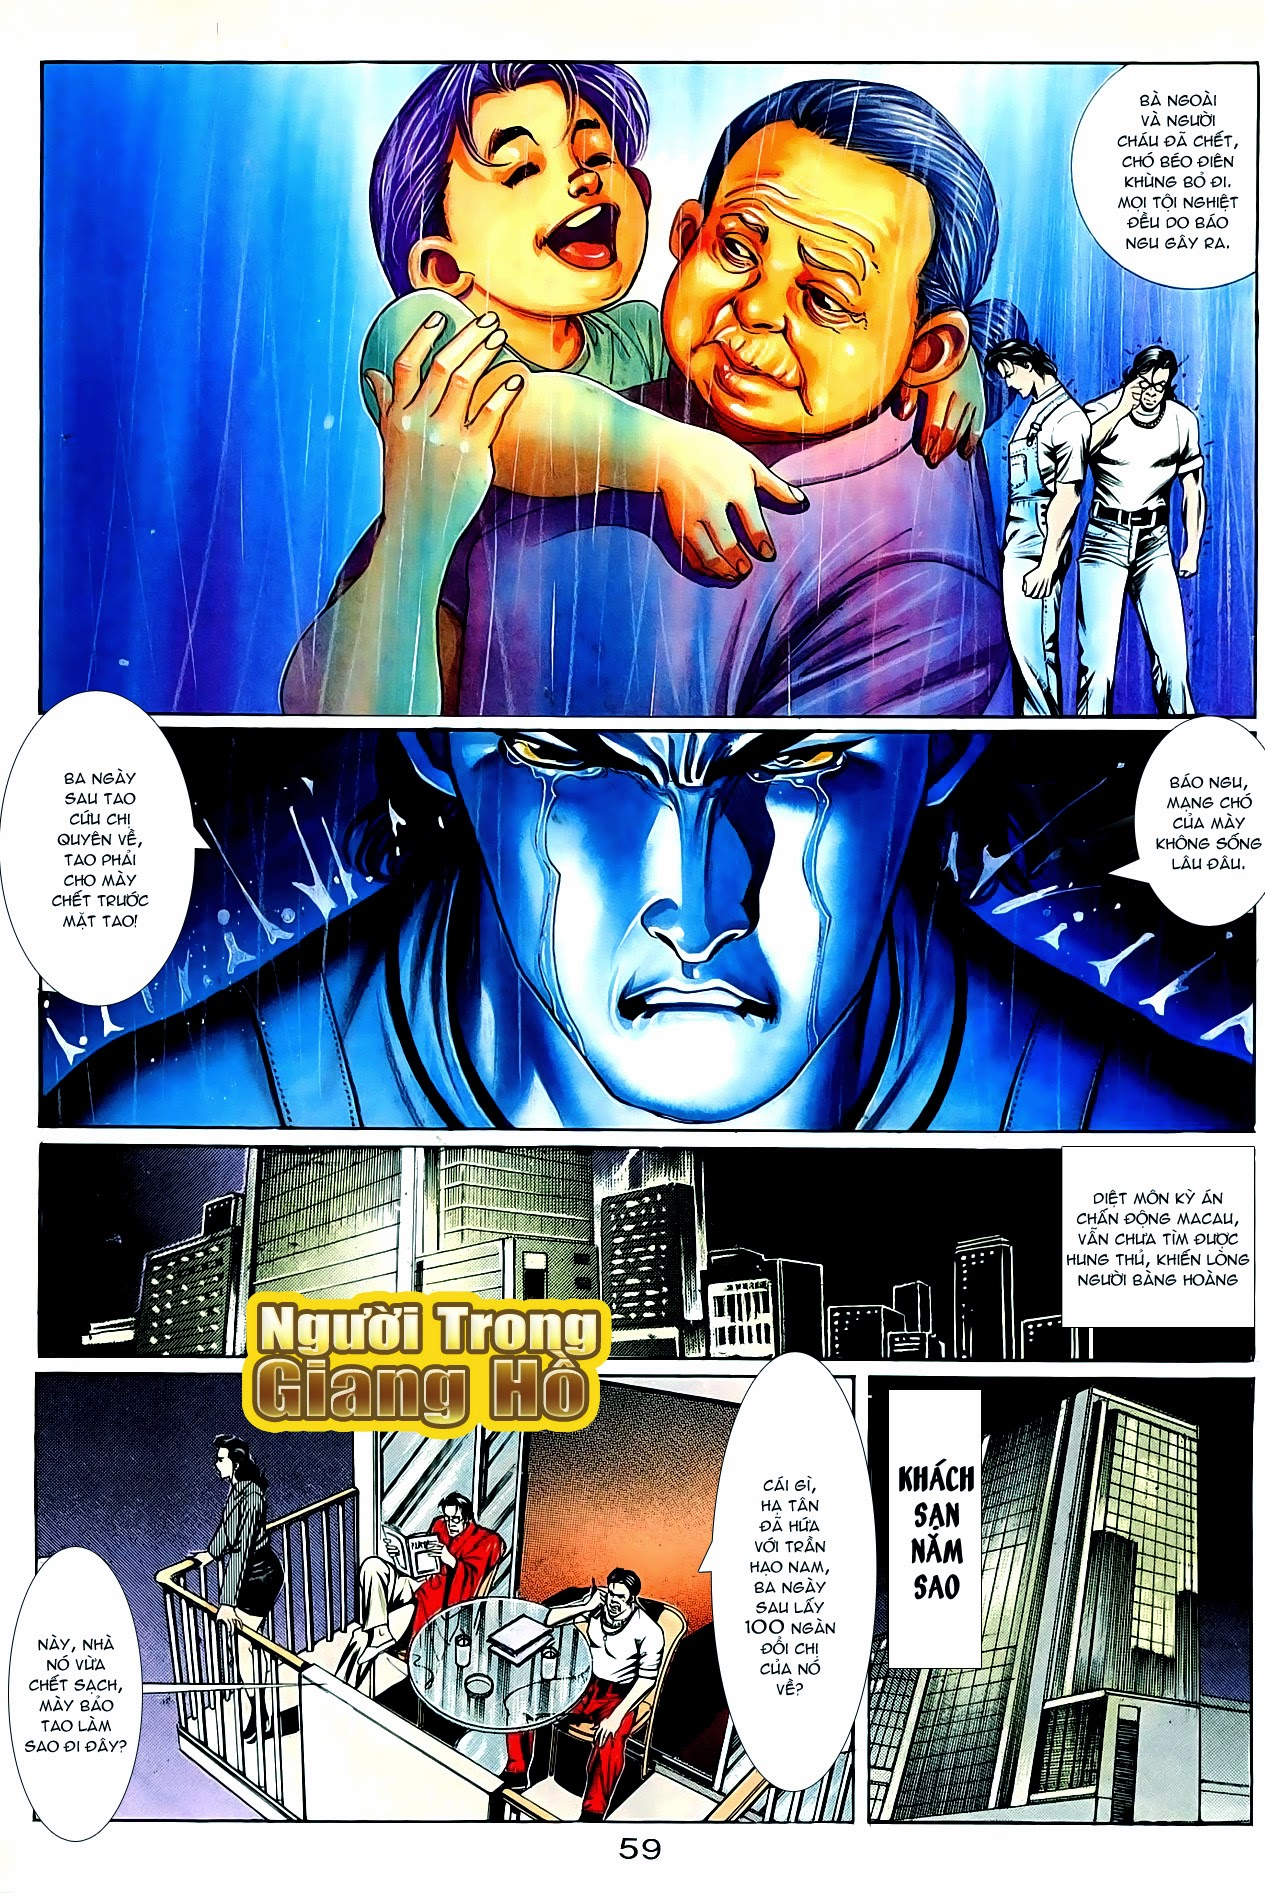 Người Trong Giang Hồ chapter 86: săn báo trang 2